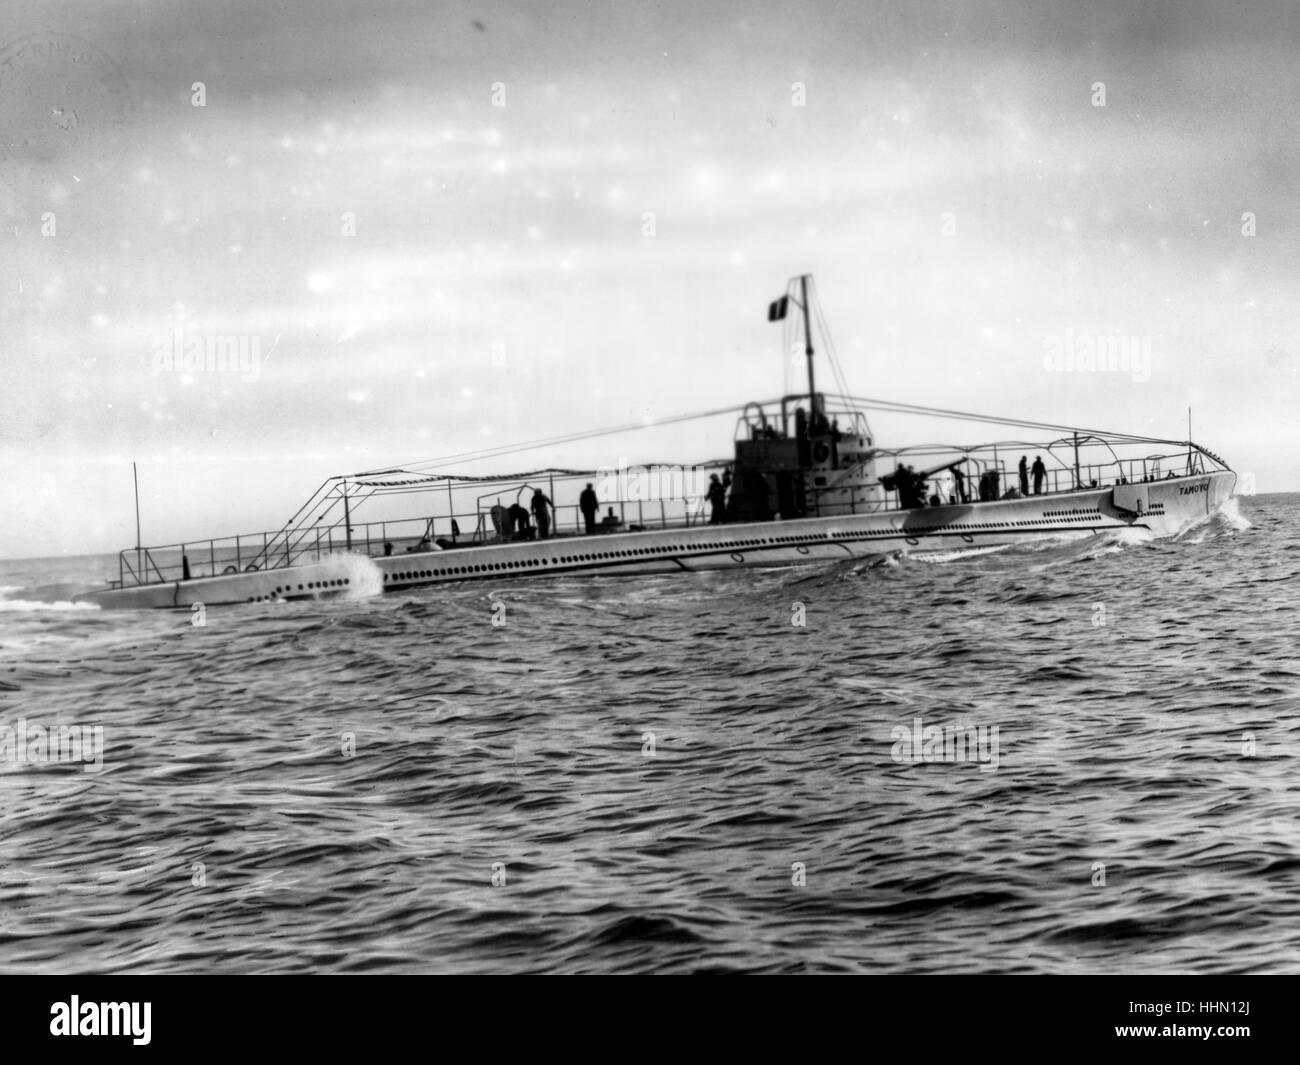 Second World War / WWII, naval warfare, italian submarine - Stock Image